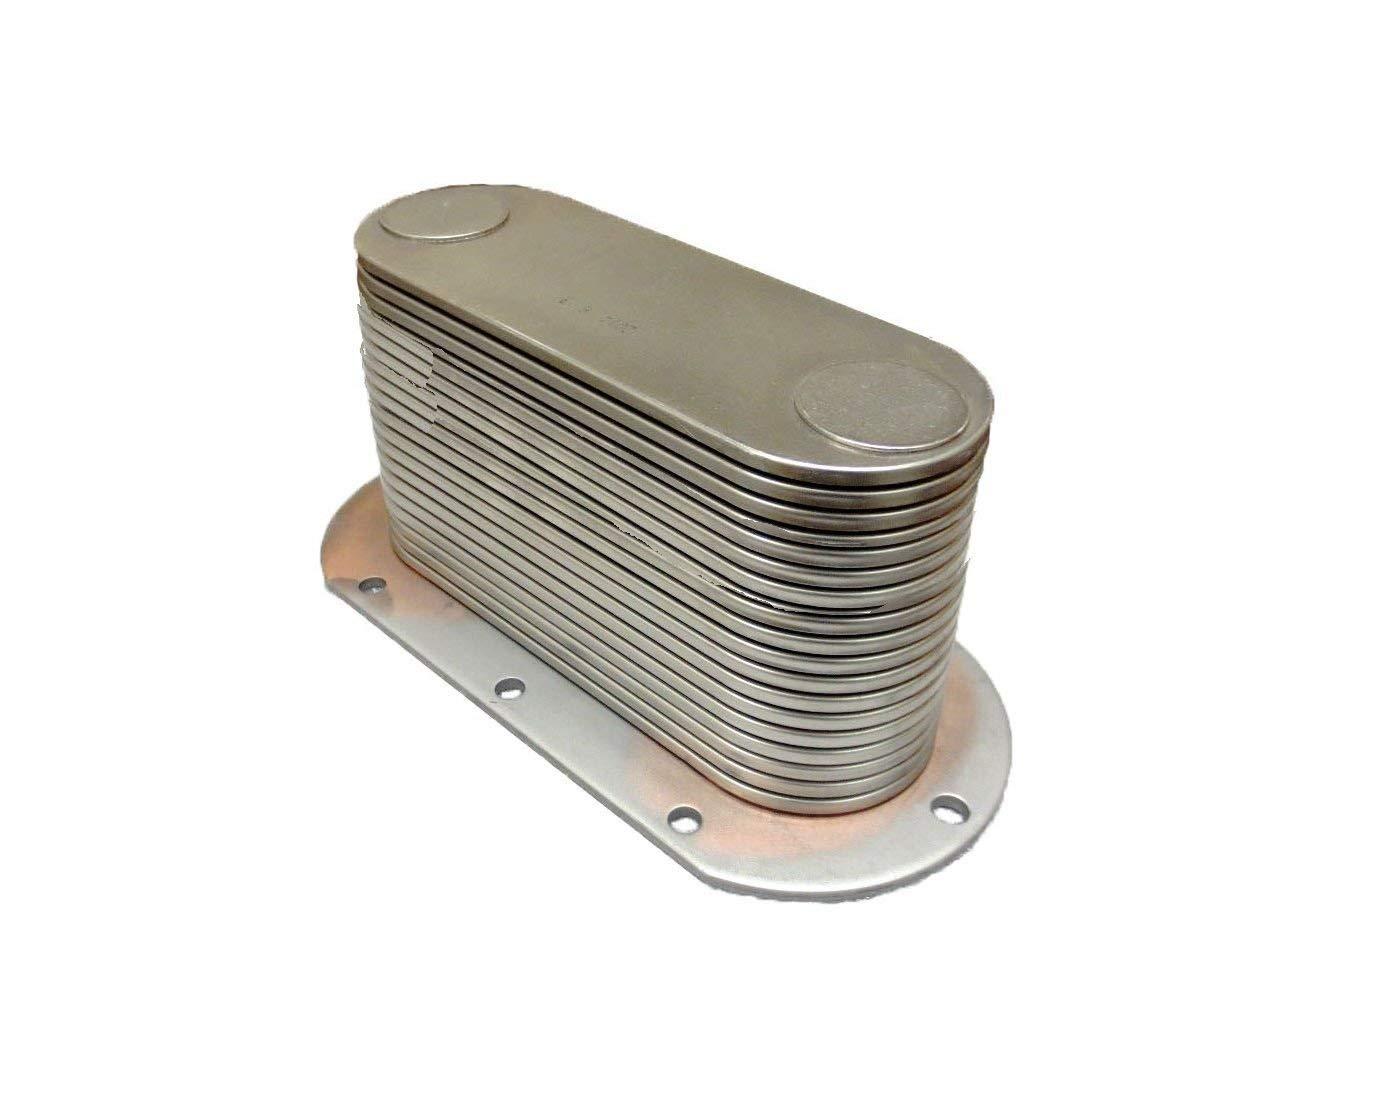 Get Quotations · Aftermarket Replacement for Detroit Diesel MTU 6V-92, 552  Series Oil Cooler